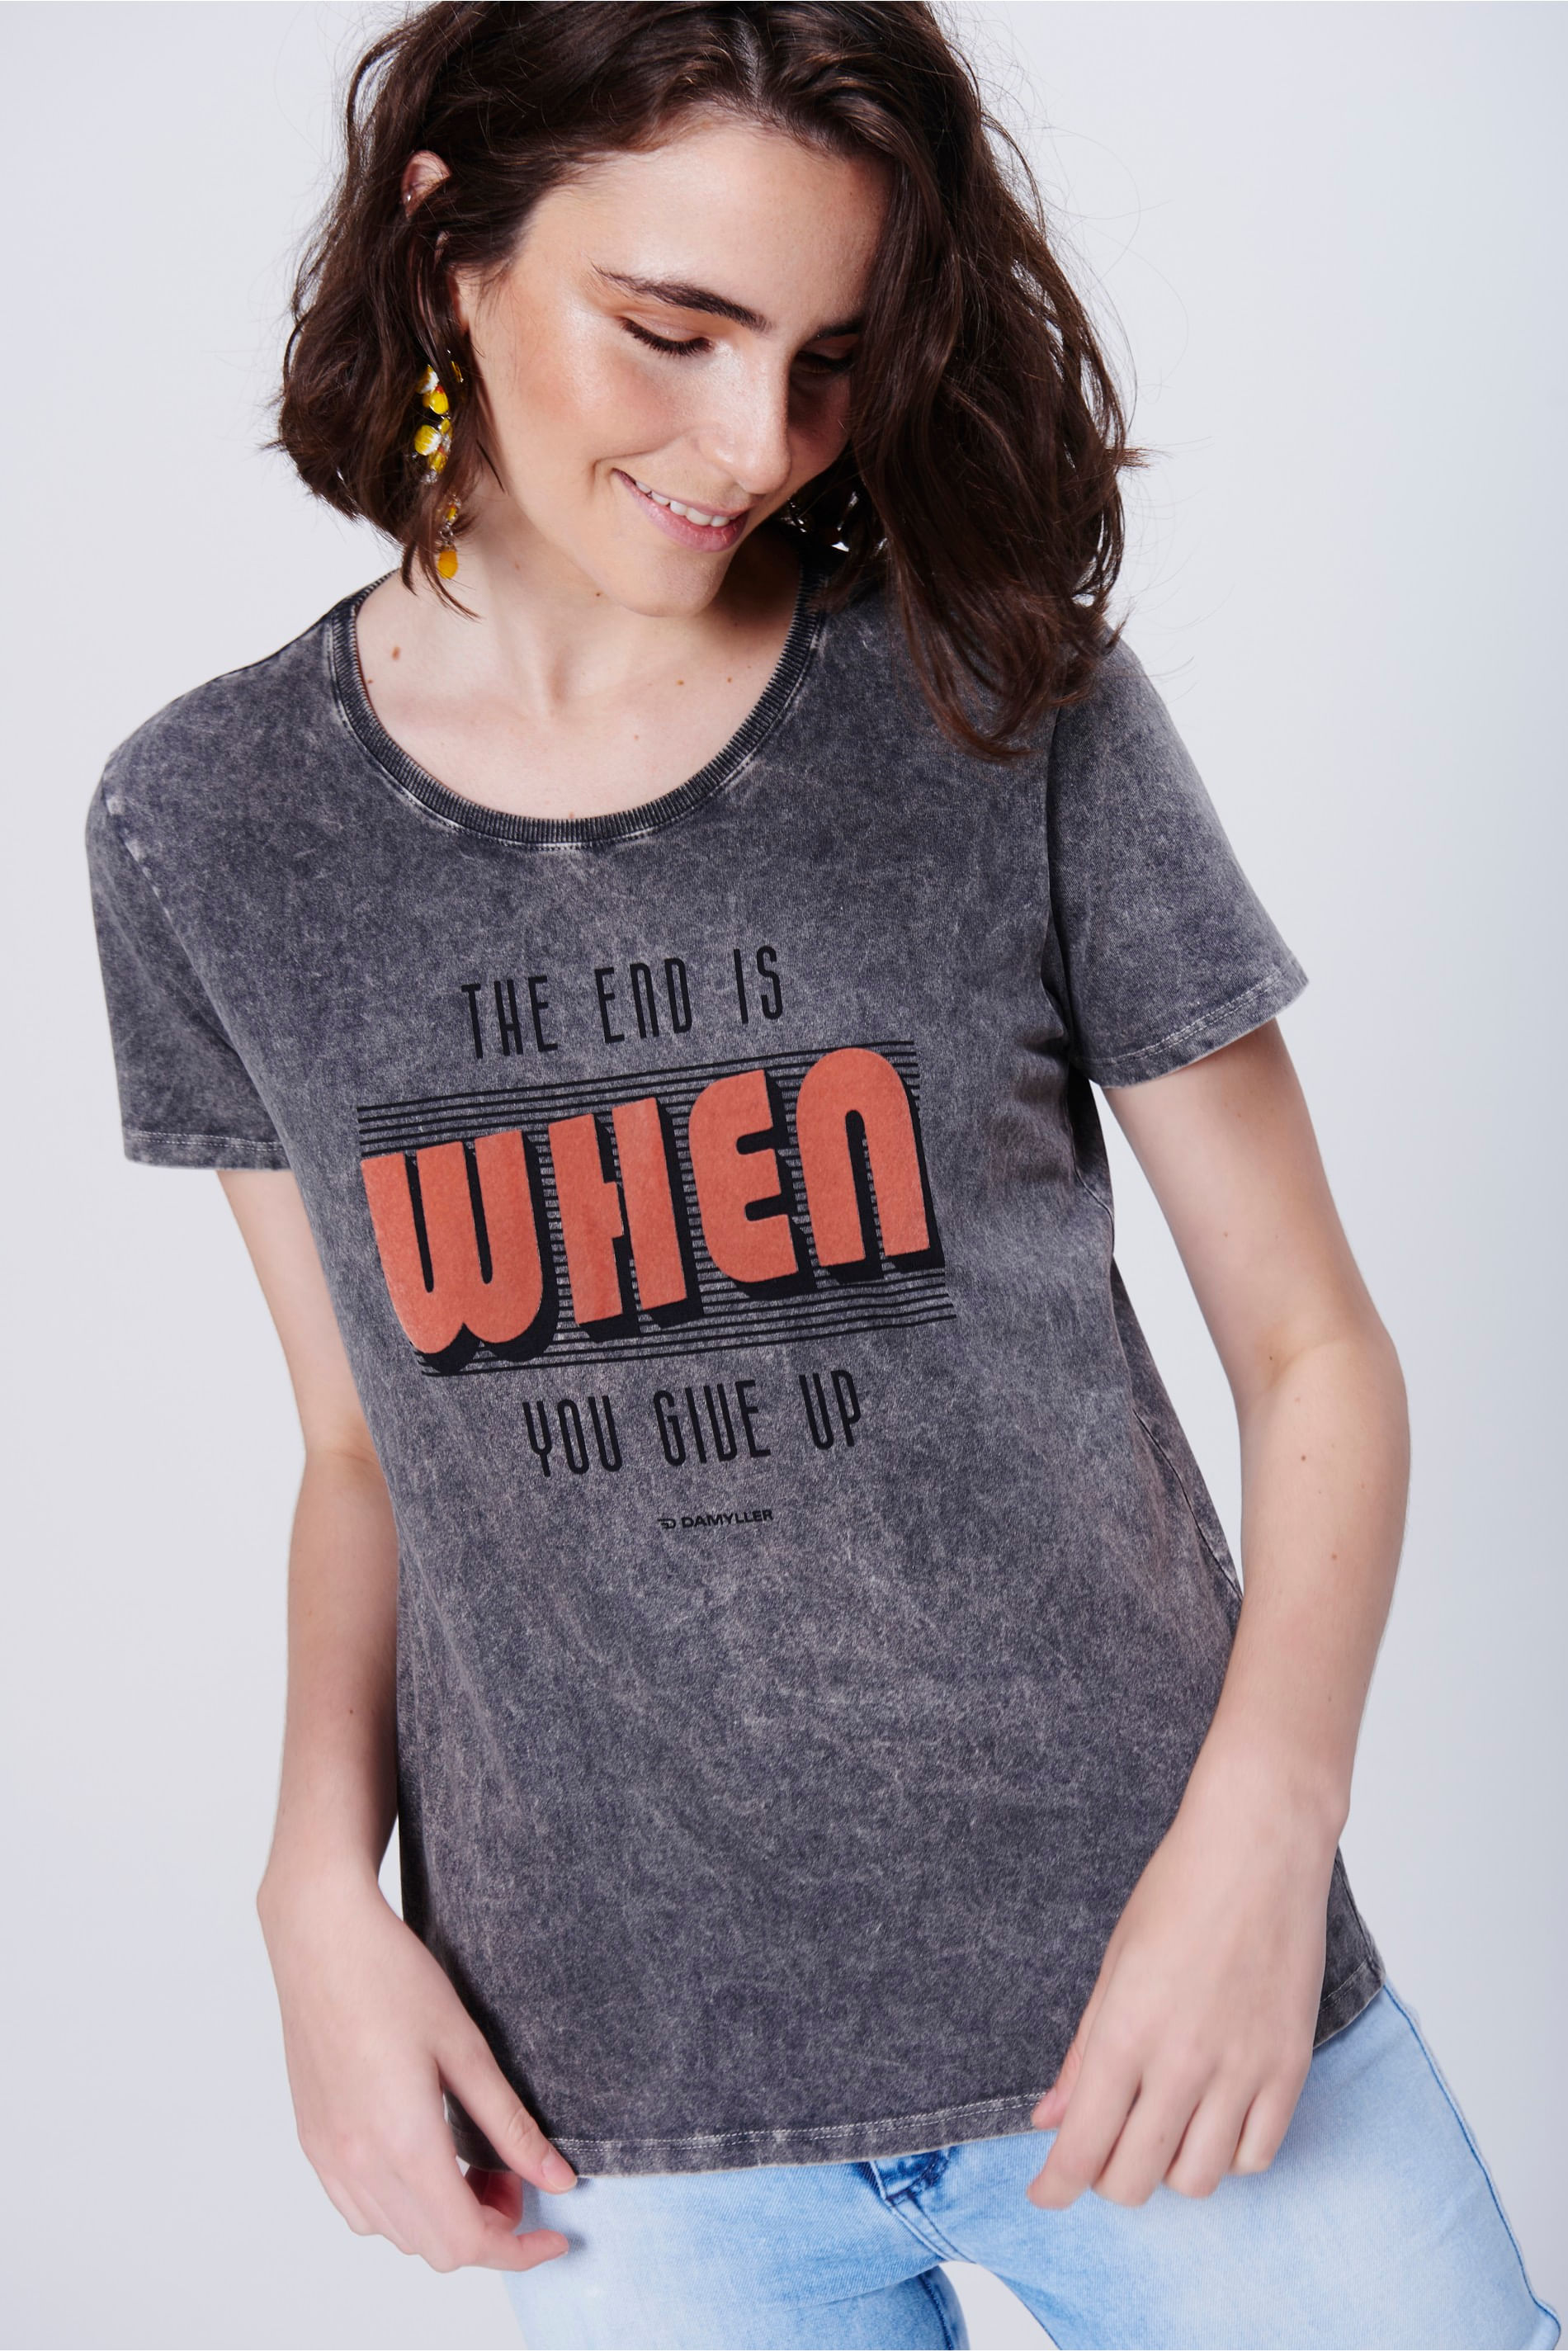 Camiseta Feminina Marmorizada - Damyller 72607b0eac4